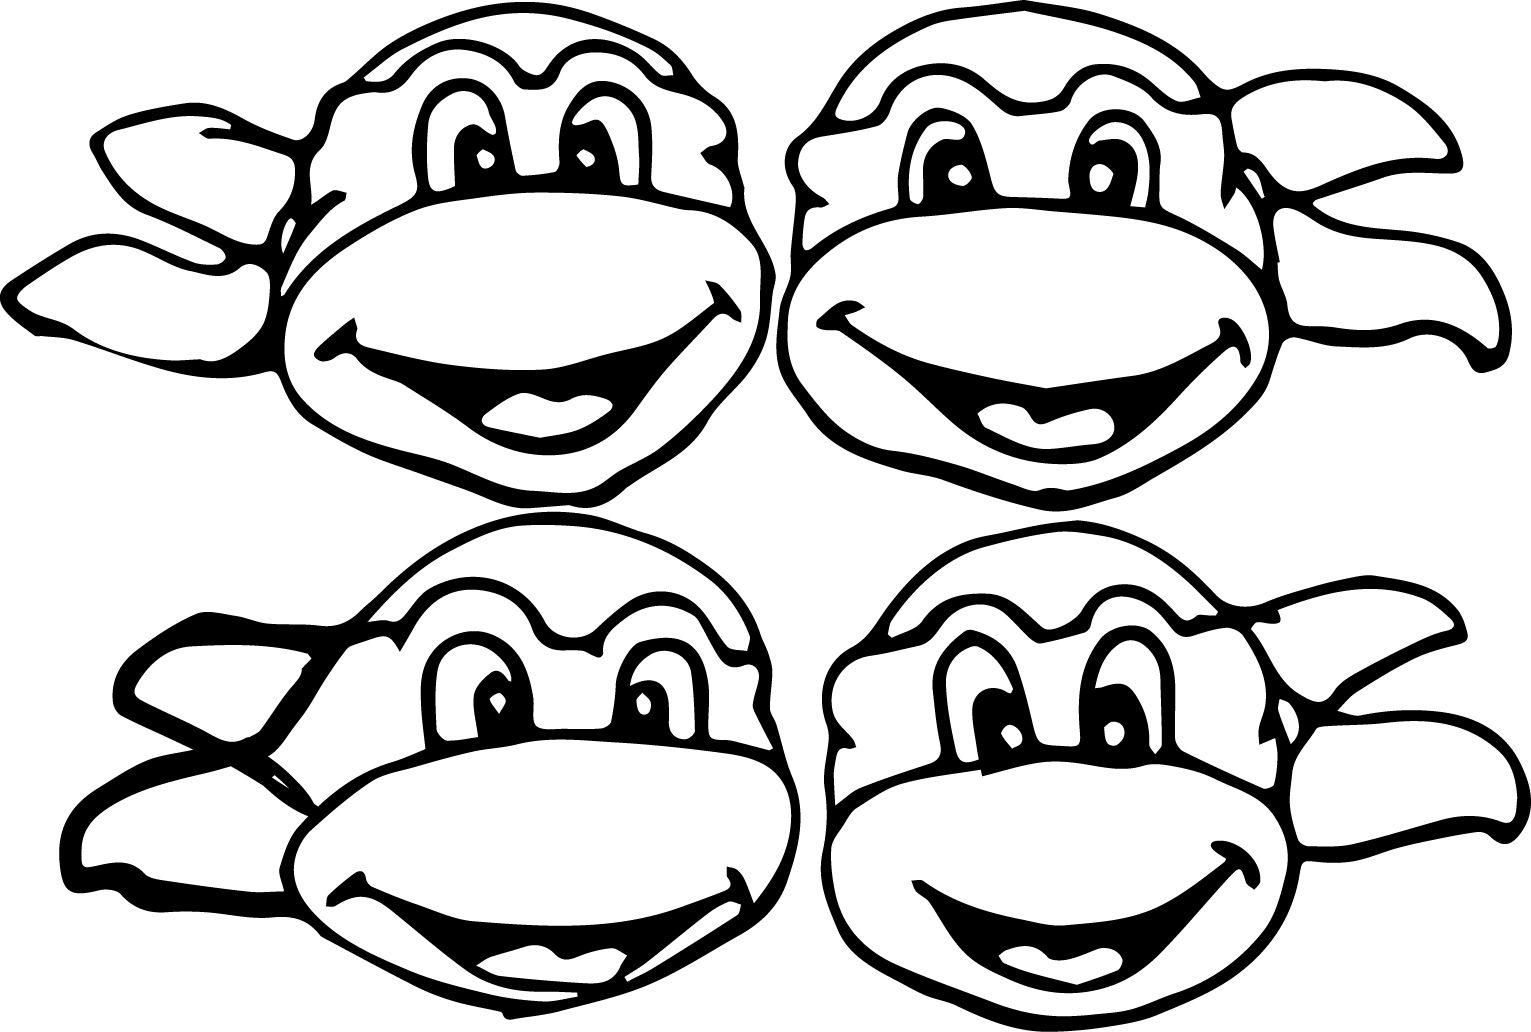 Ninja turtles coloring page - 4 Four Head Ninja Mutant Turtle Coloring Page